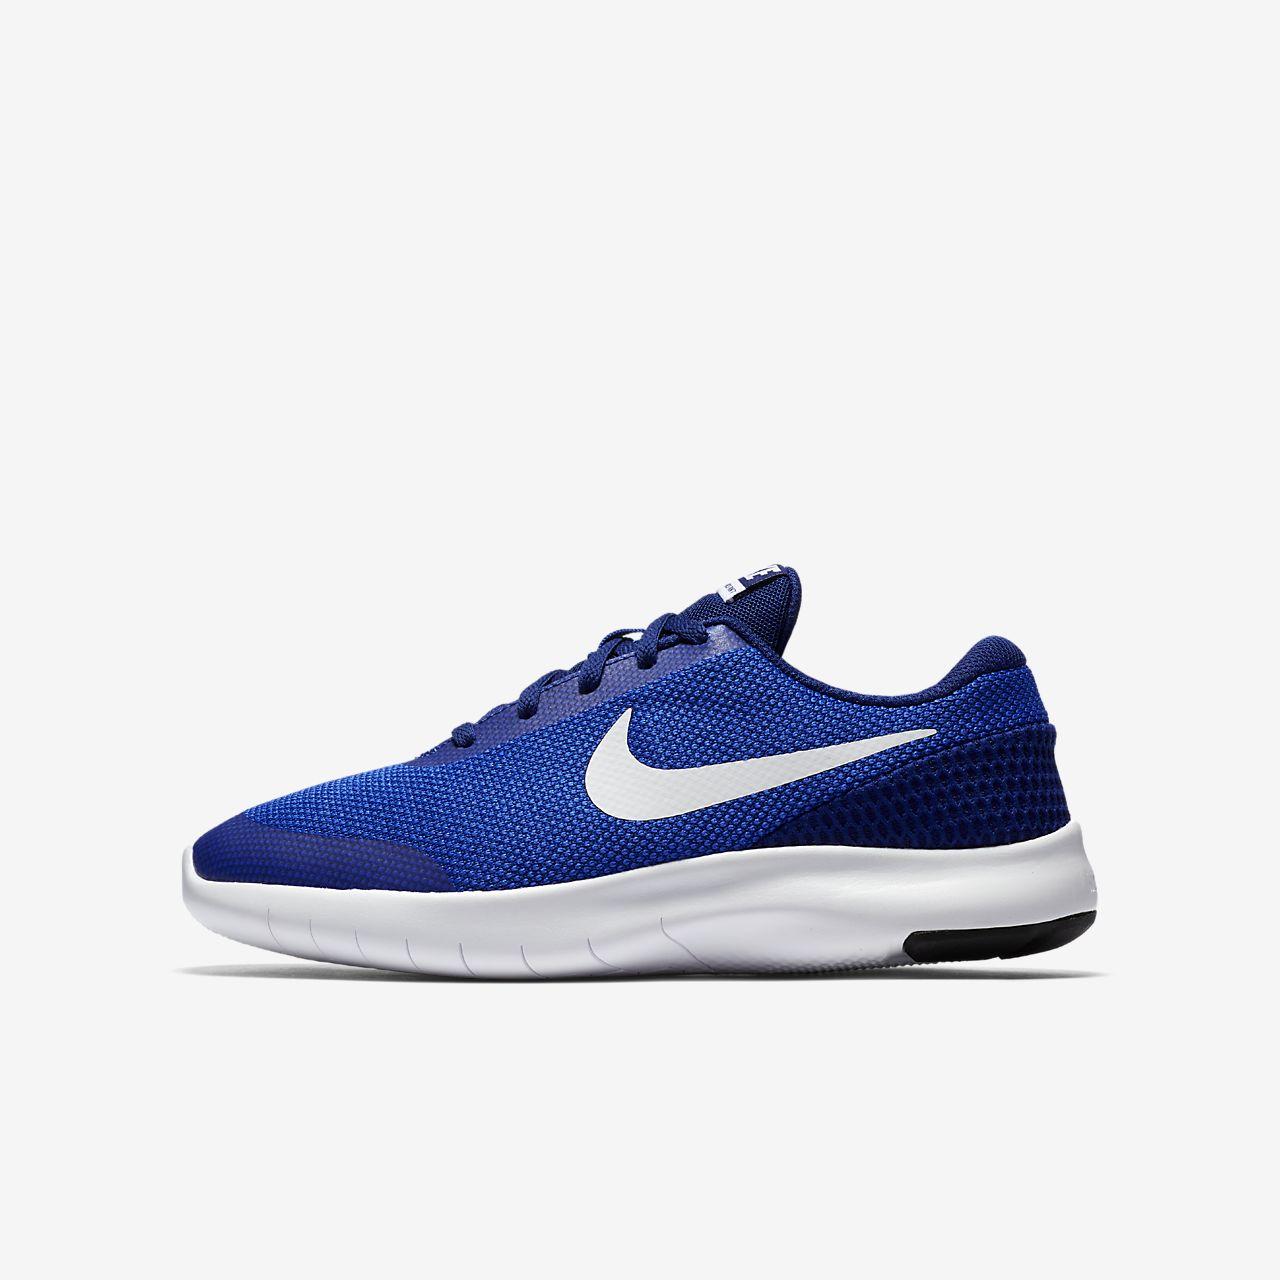 9d40cdab94d3b Nike Flex Experience Run 7 Older Kids  Running Shoe. Nike.com AT